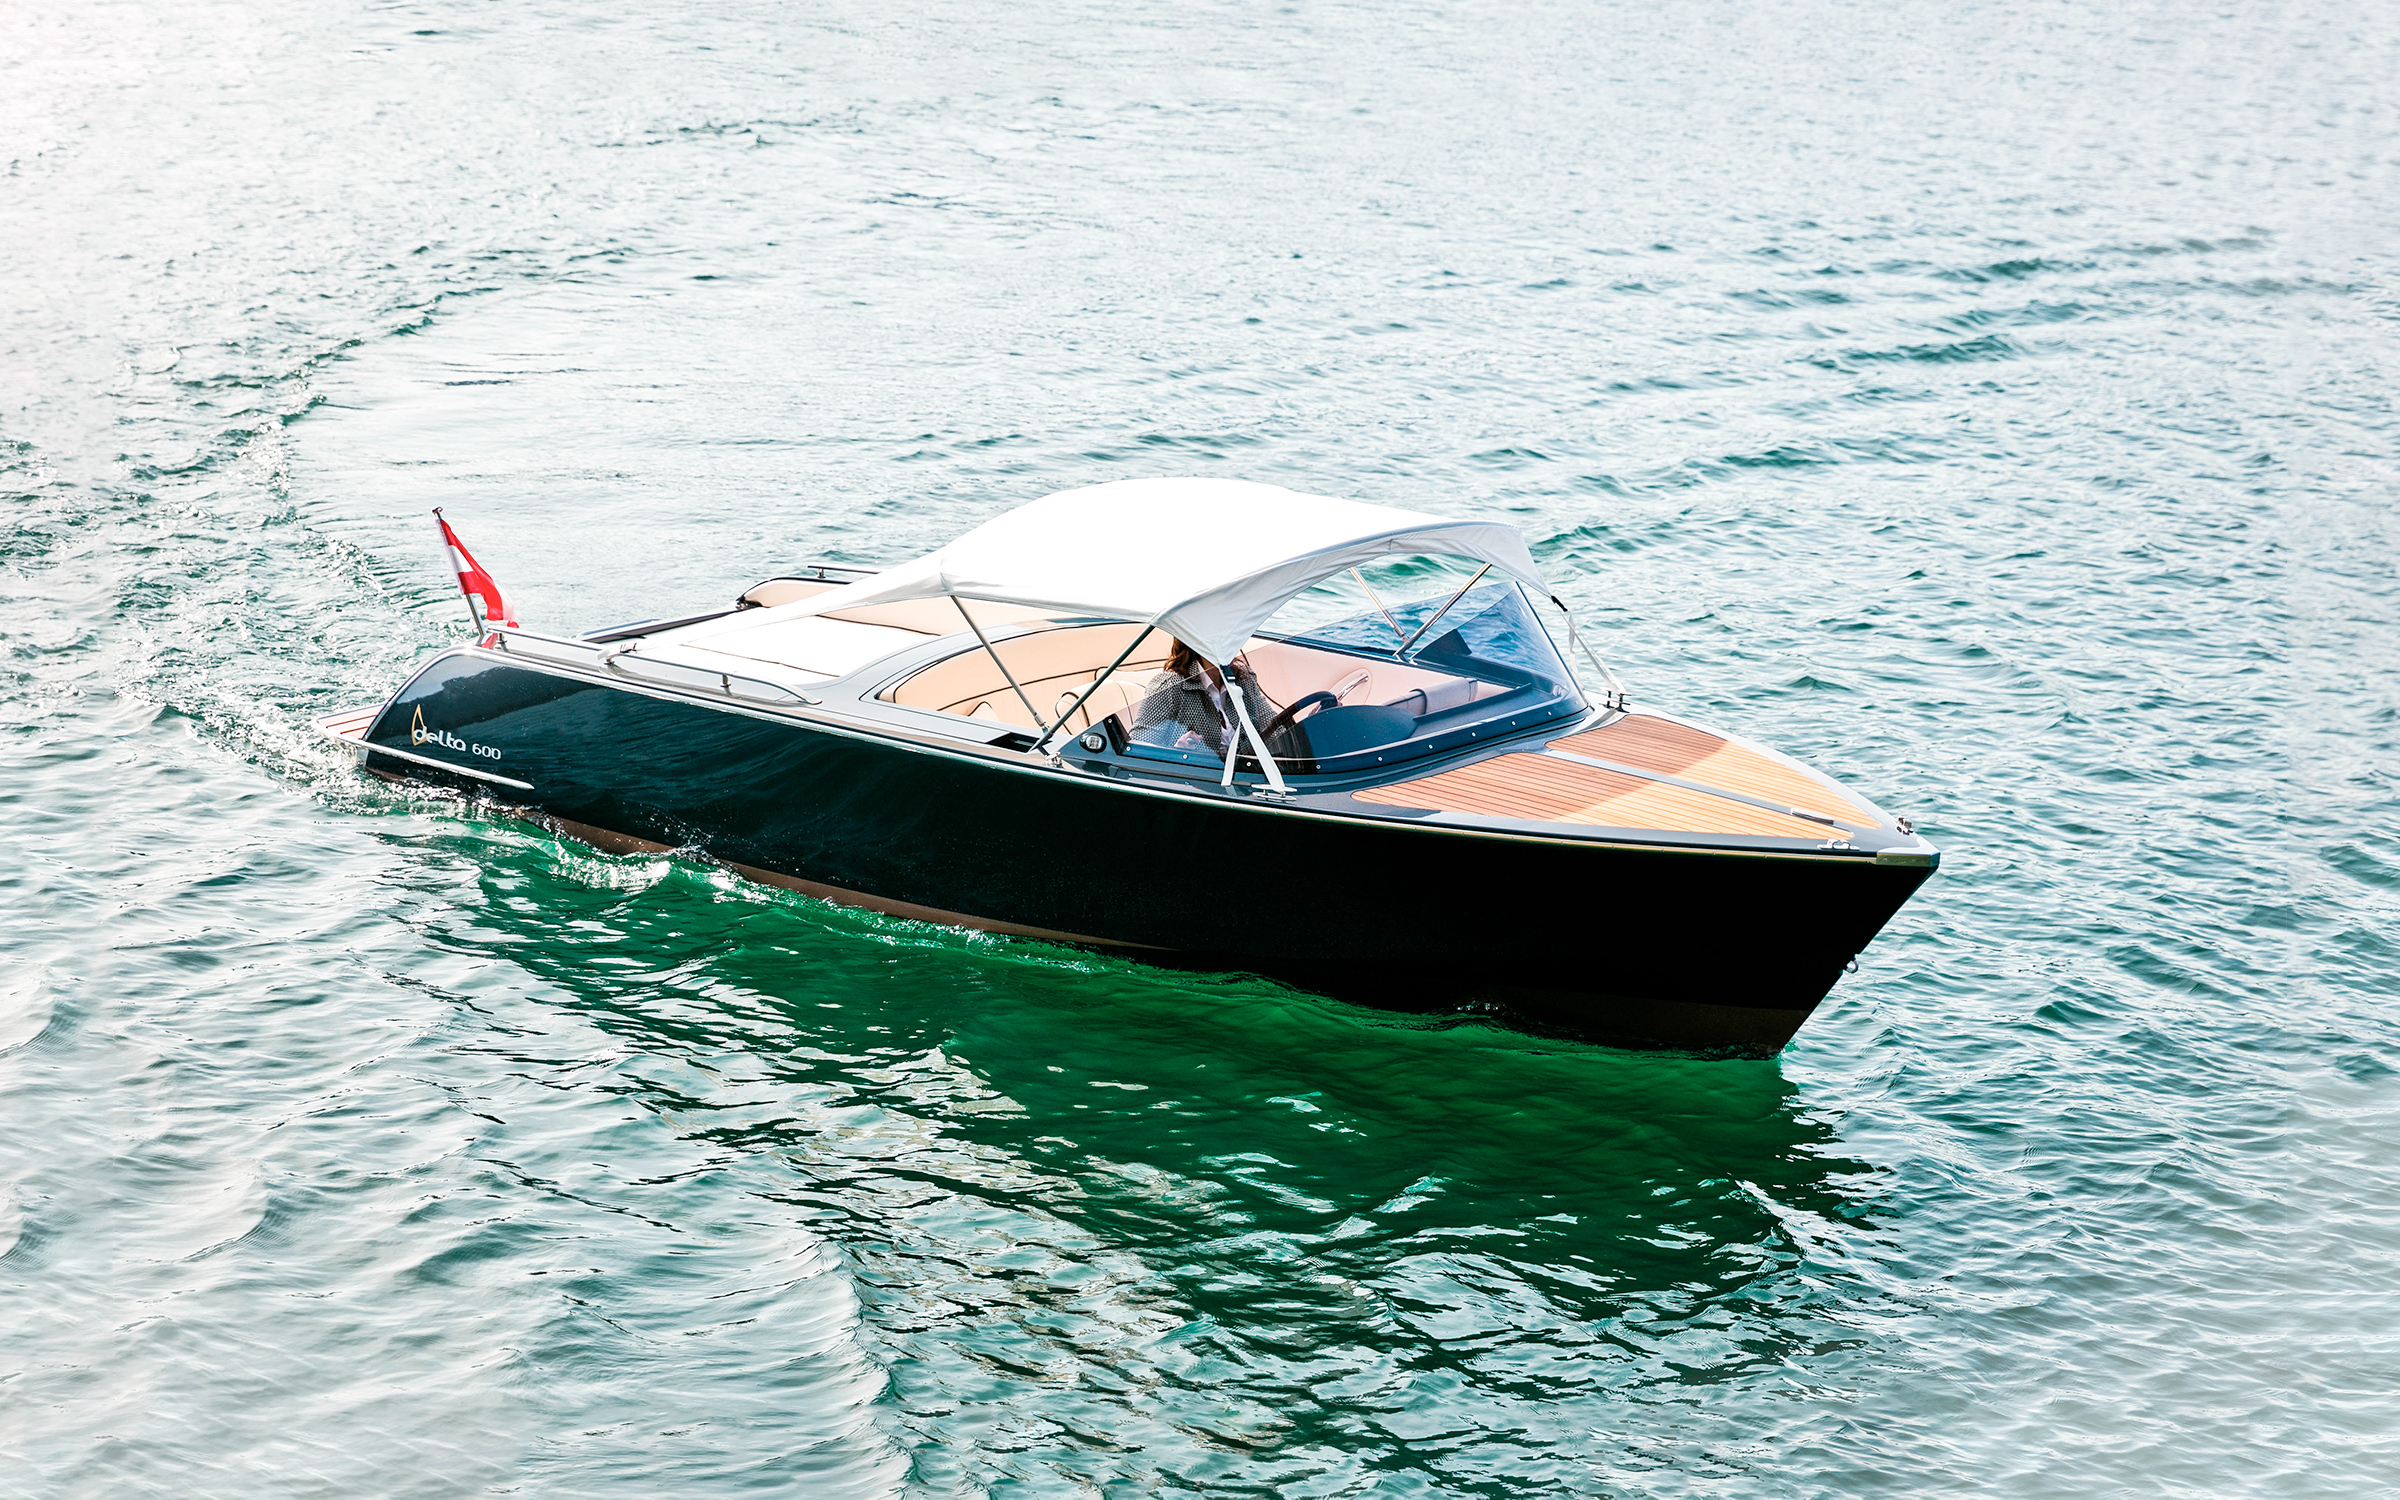 elektroboot delta 600 marian boote. Black Bedroom Furniture Sets. Home Design Ideas